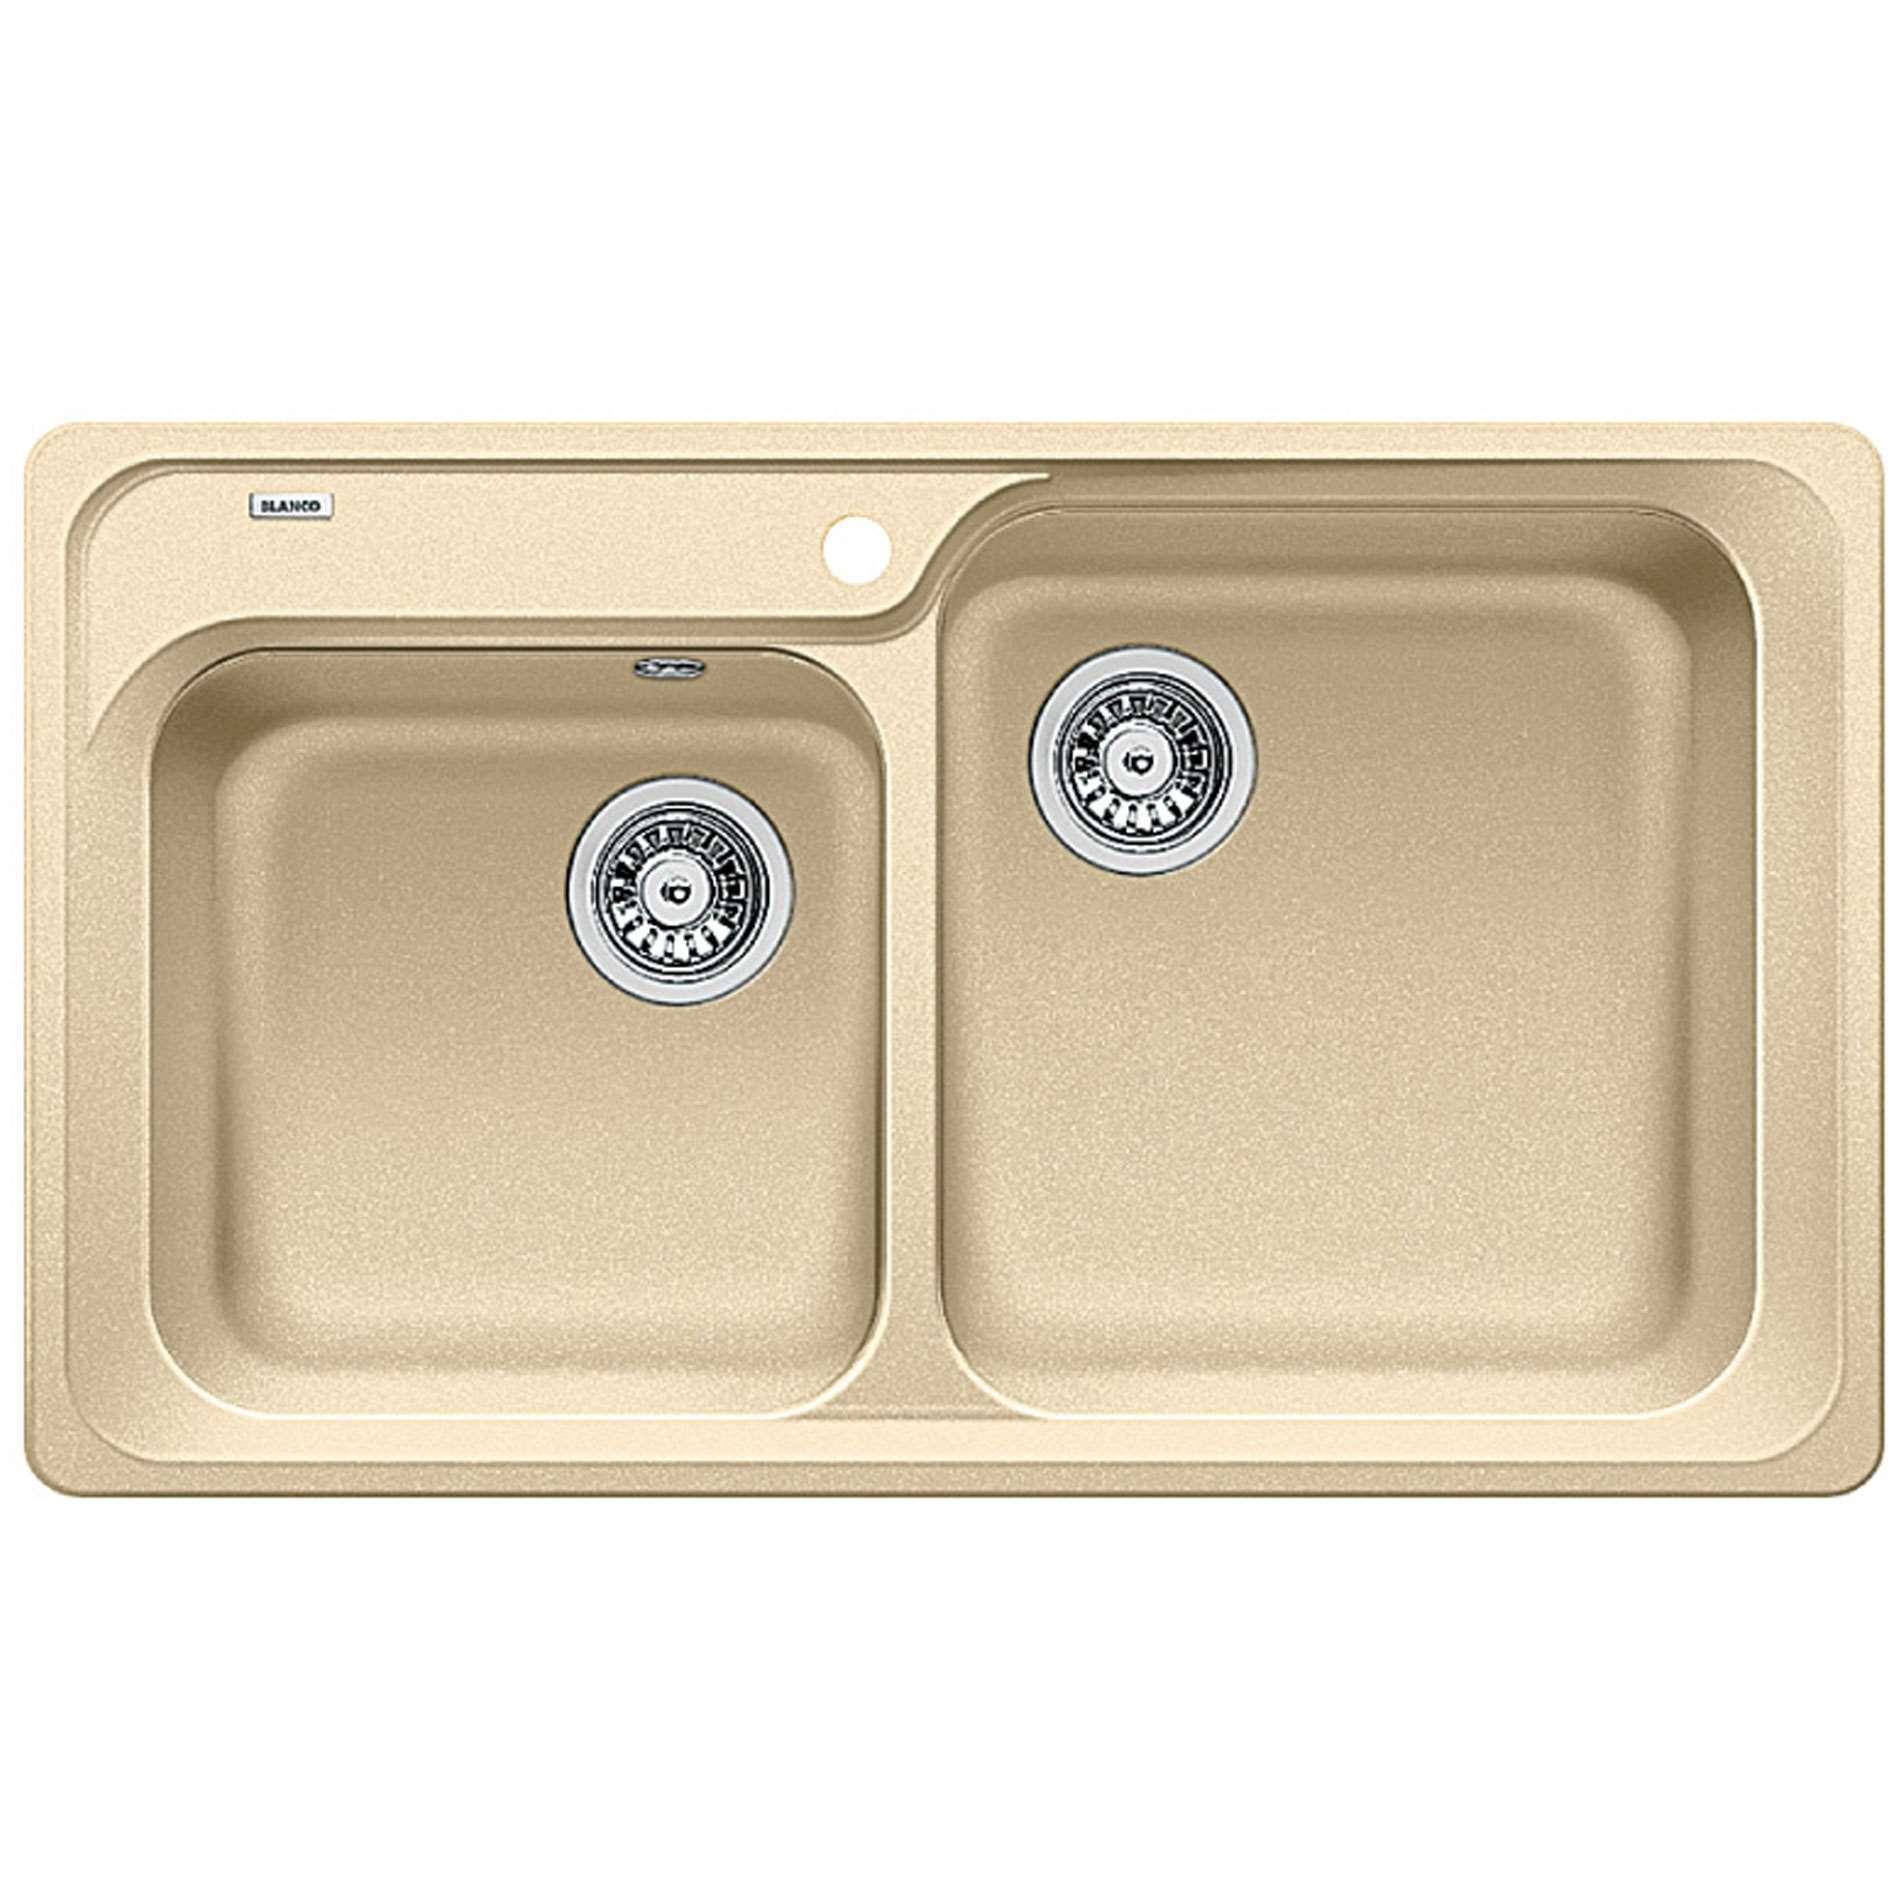 Blanco Silgranit Sink Accessories : Blanco: Classic 8 Champagne Silgranit Sink - Kitchen Sinks & Taps